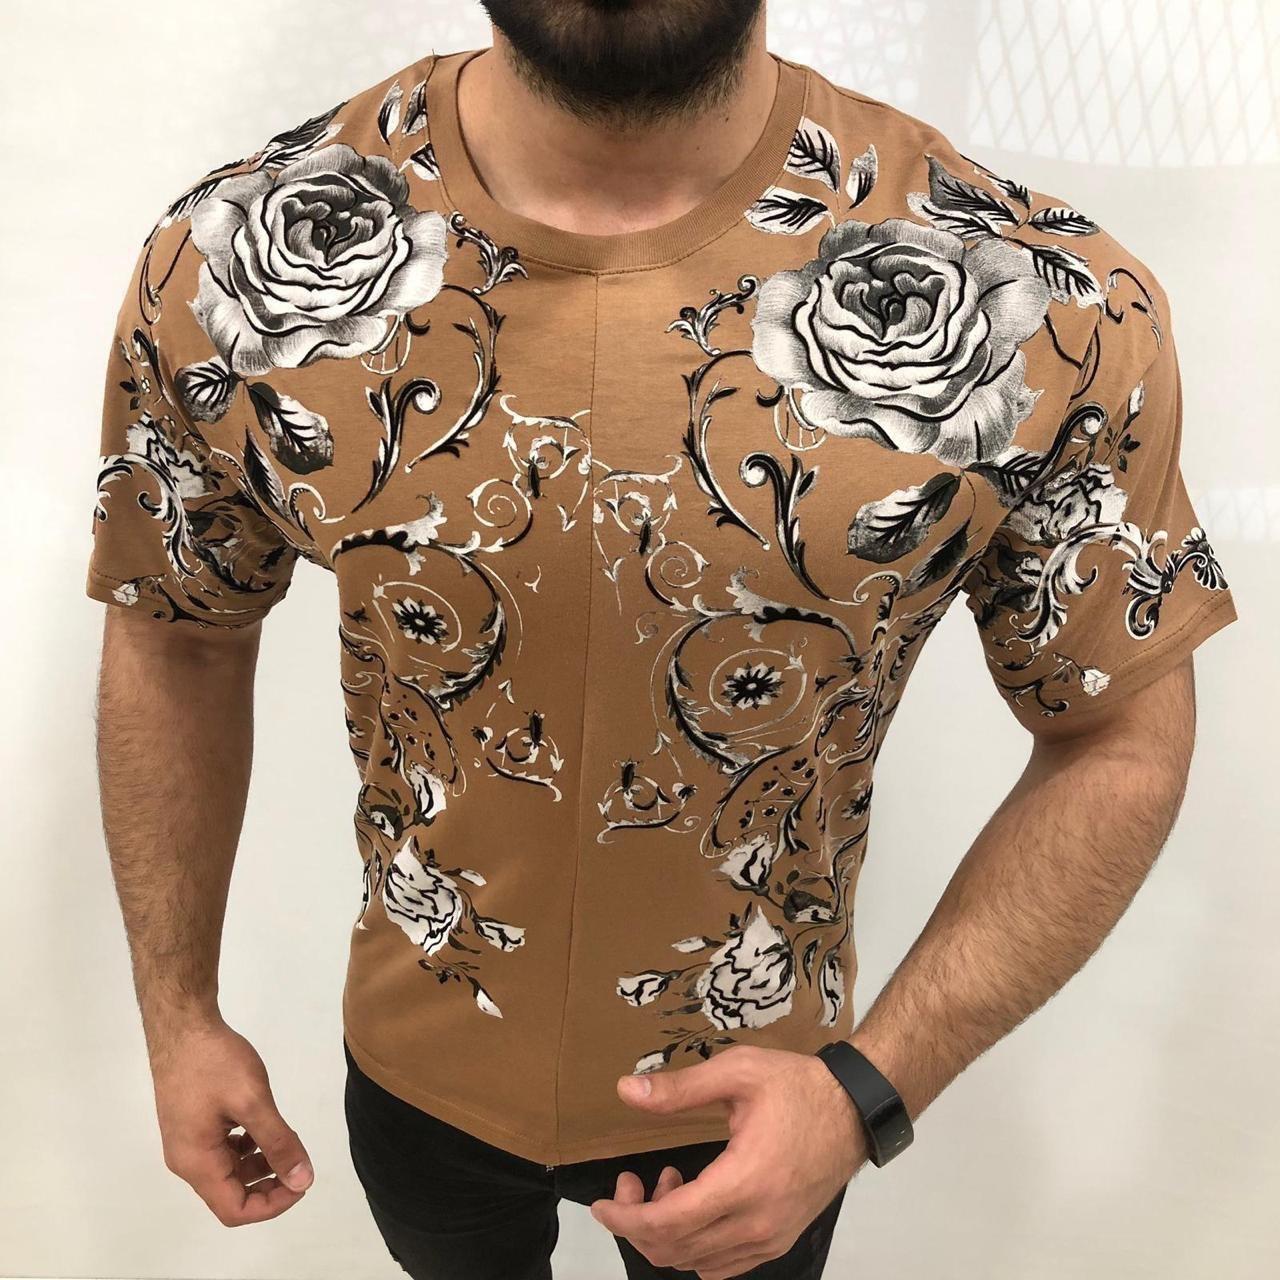 😜 Футболка - Мужская футболка  бежевая с розами (контуры велюр)